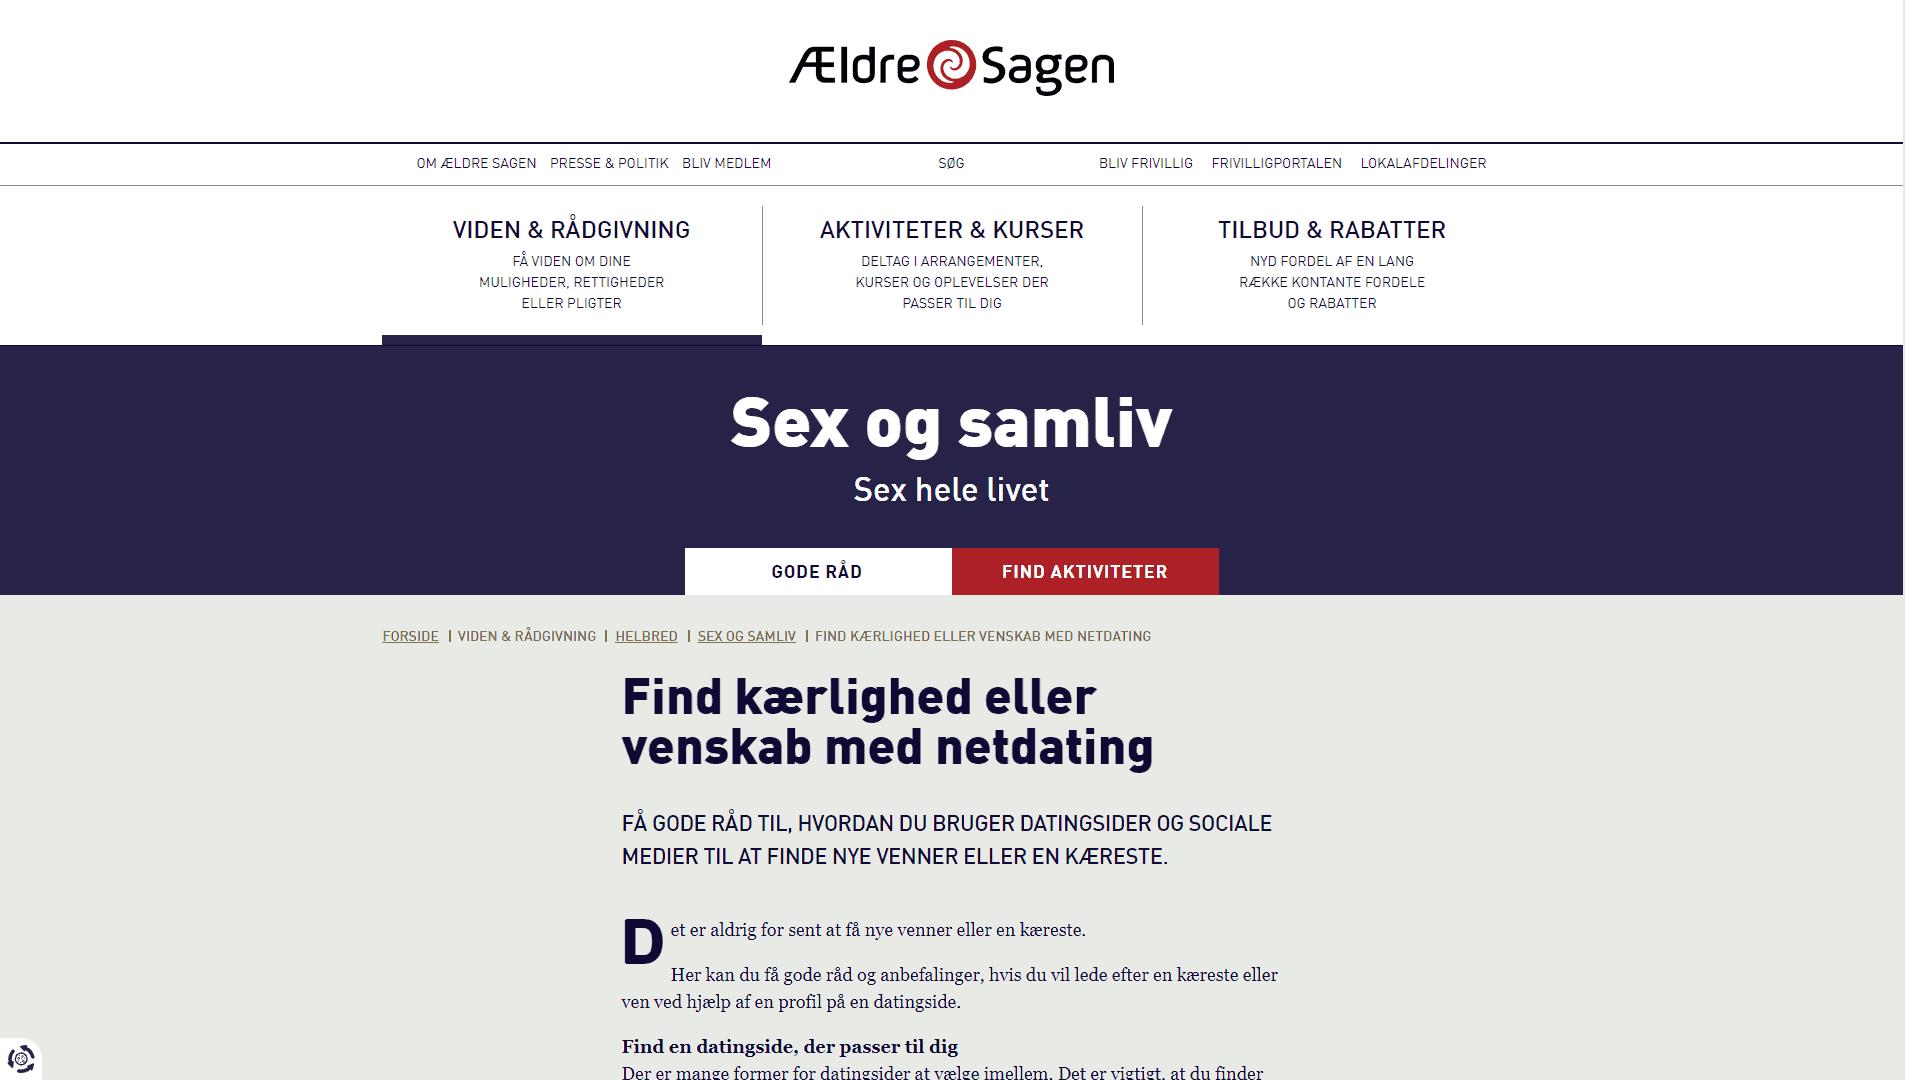 Real sex in massage norske amatører sex - Norske store pupper big tits porno